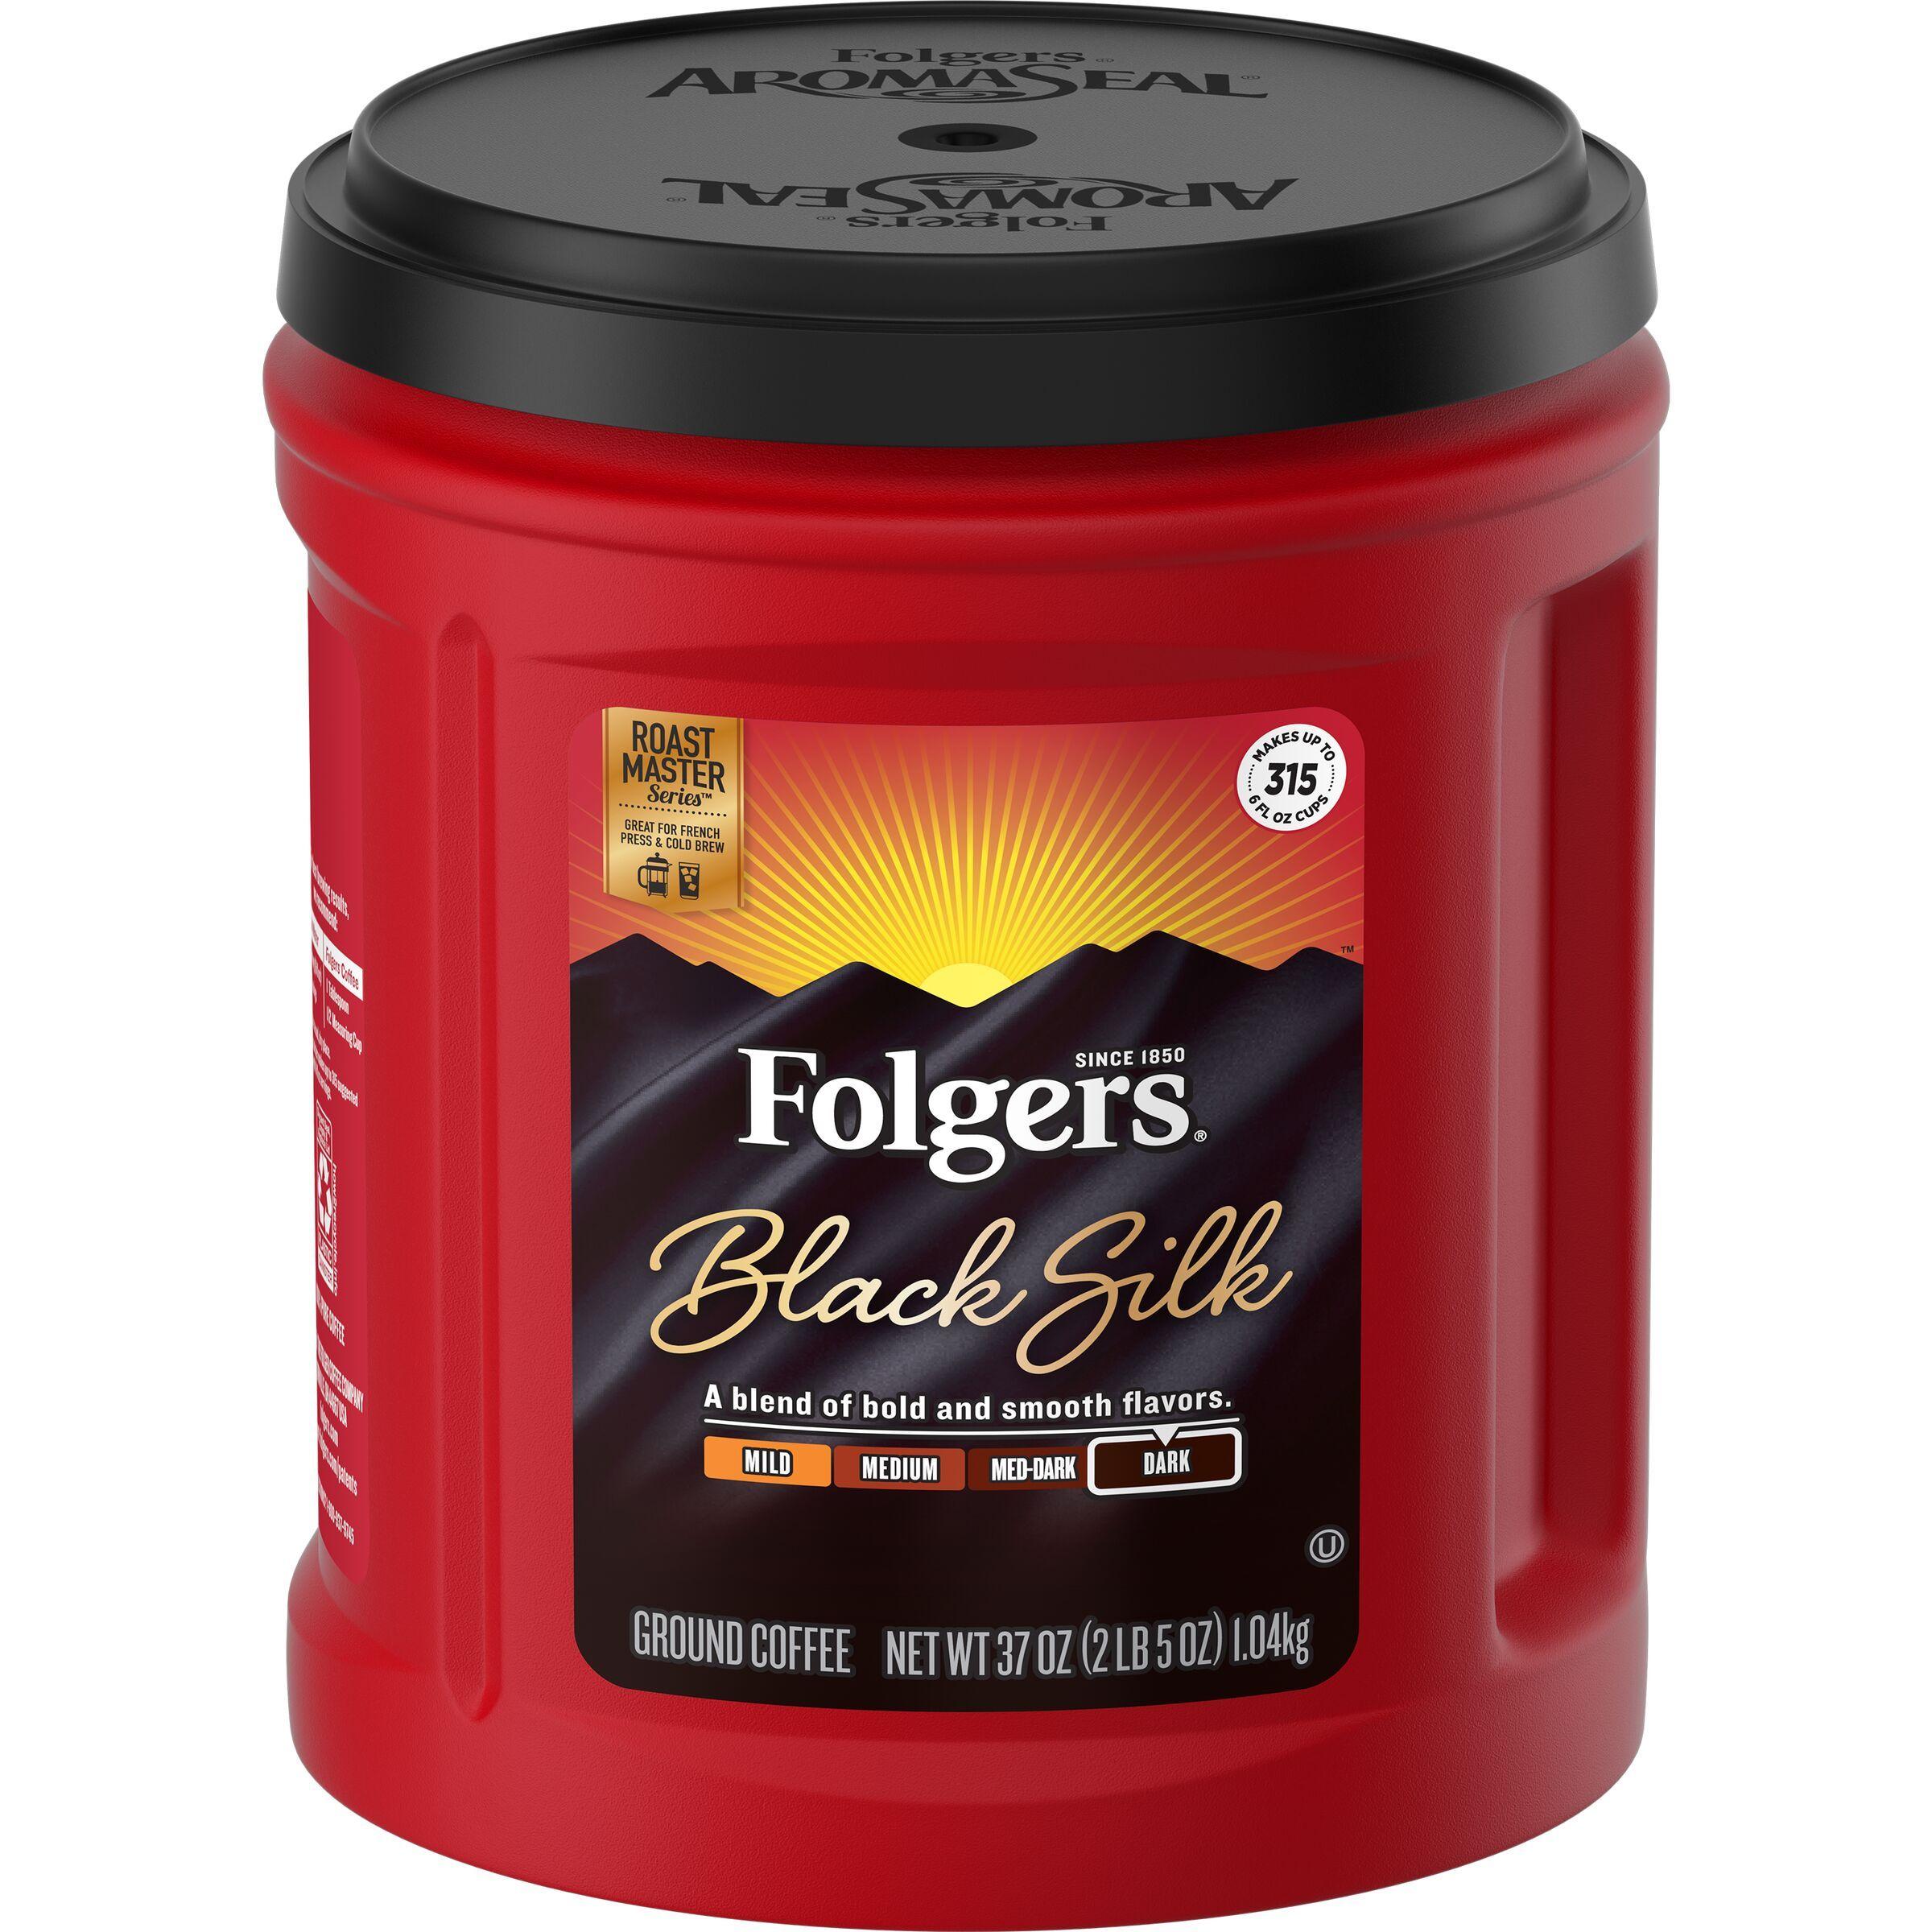 Folgers Black Silk Ground Coffee, 37Ounce